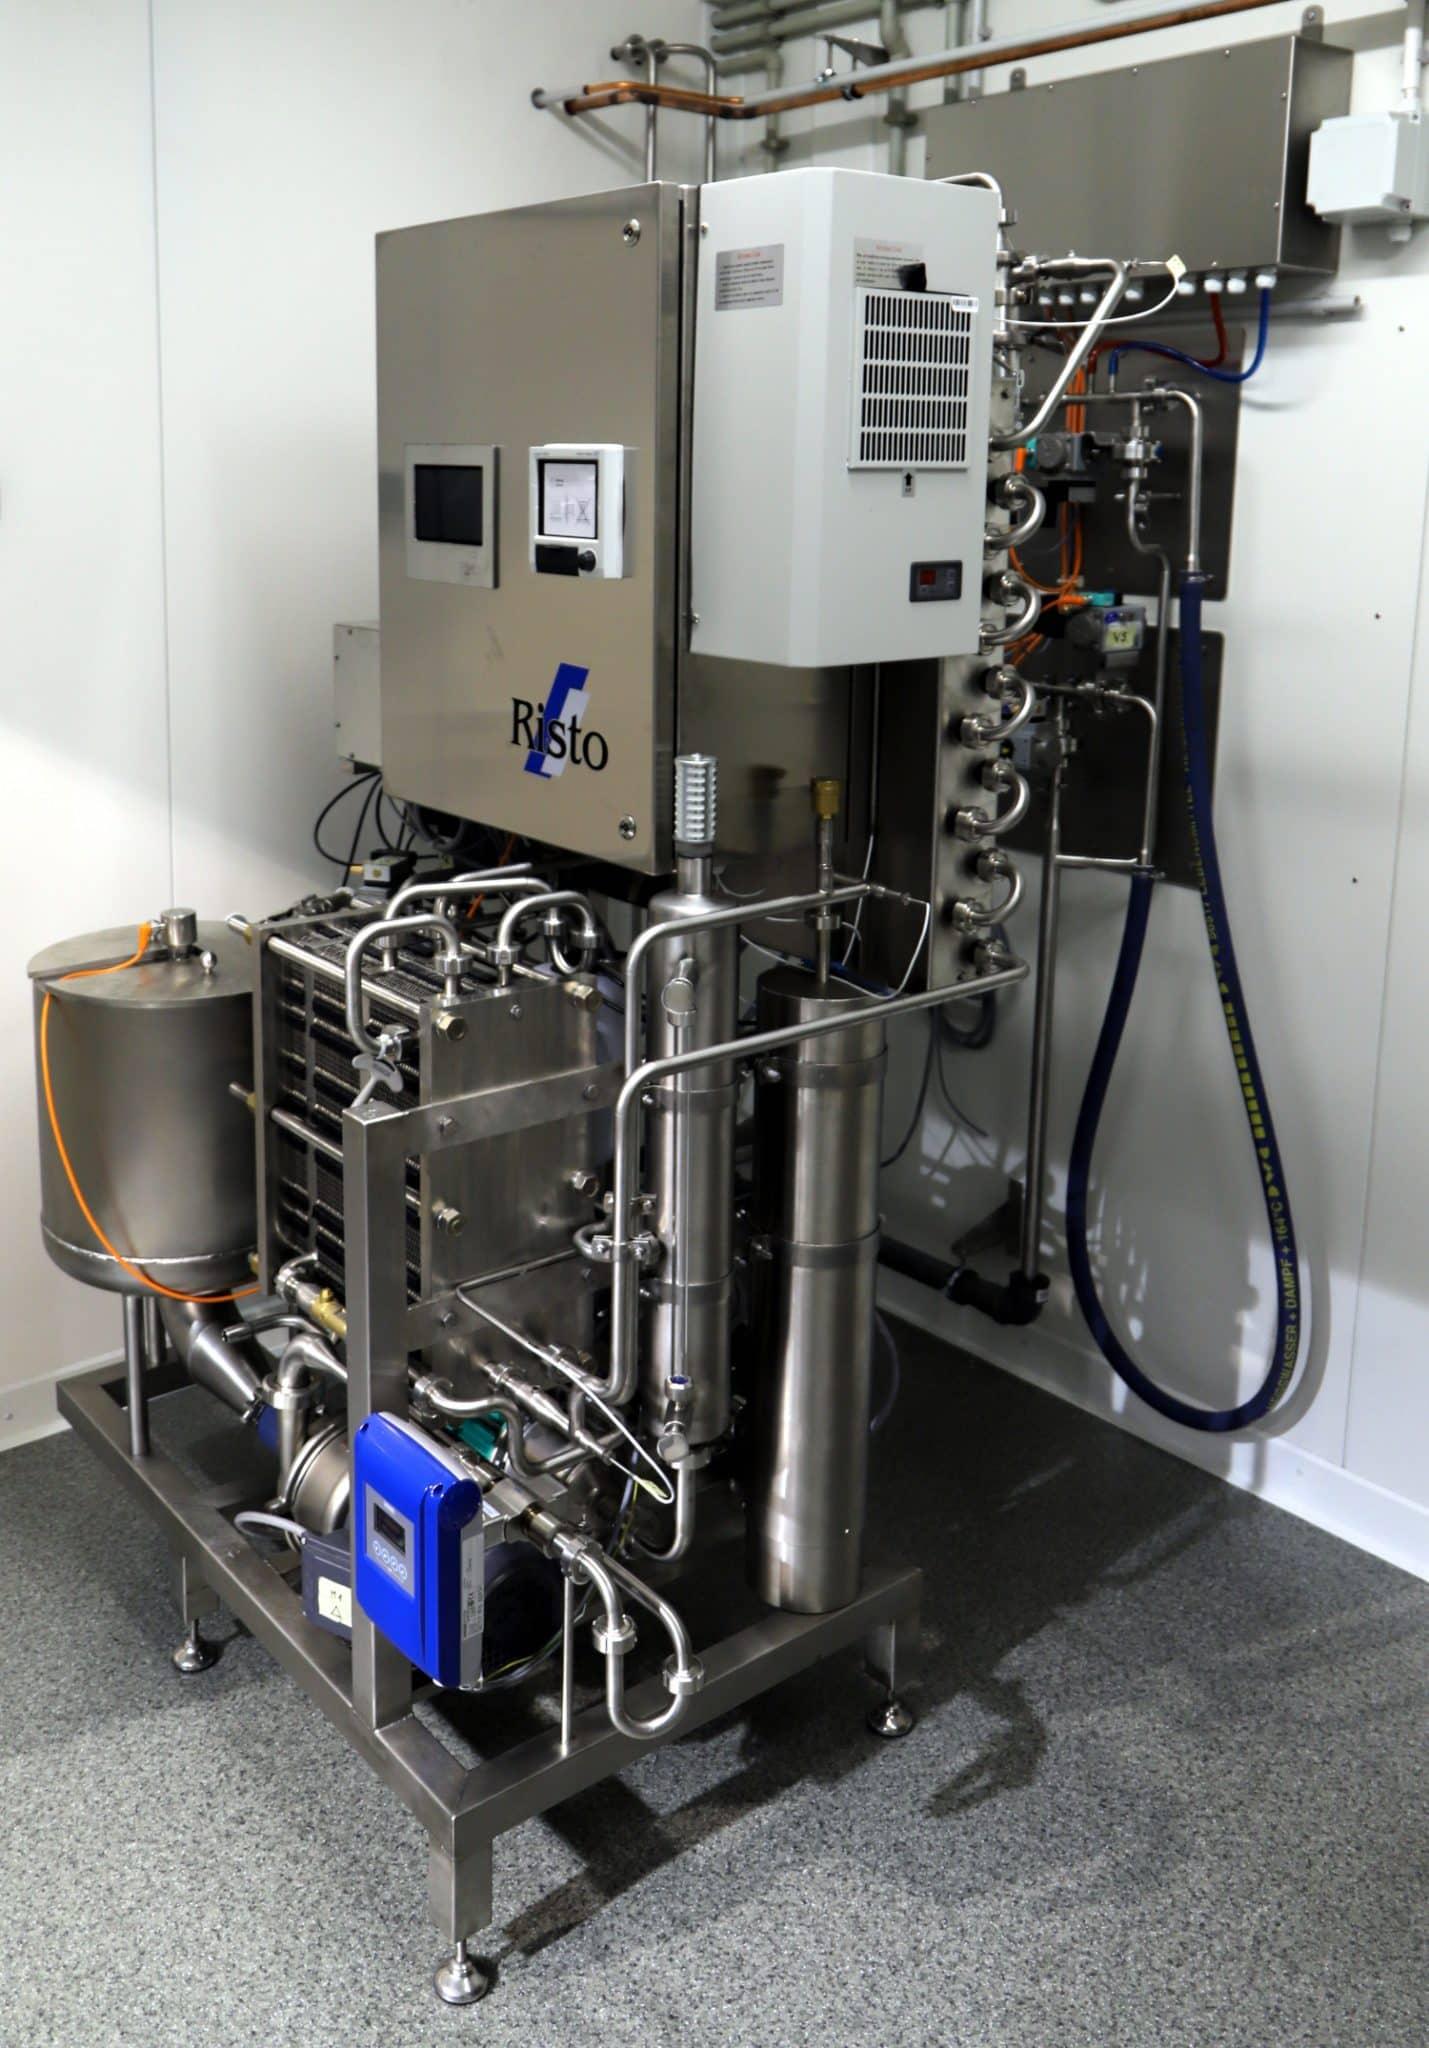 Plattenpasteur PP-400 from Risto